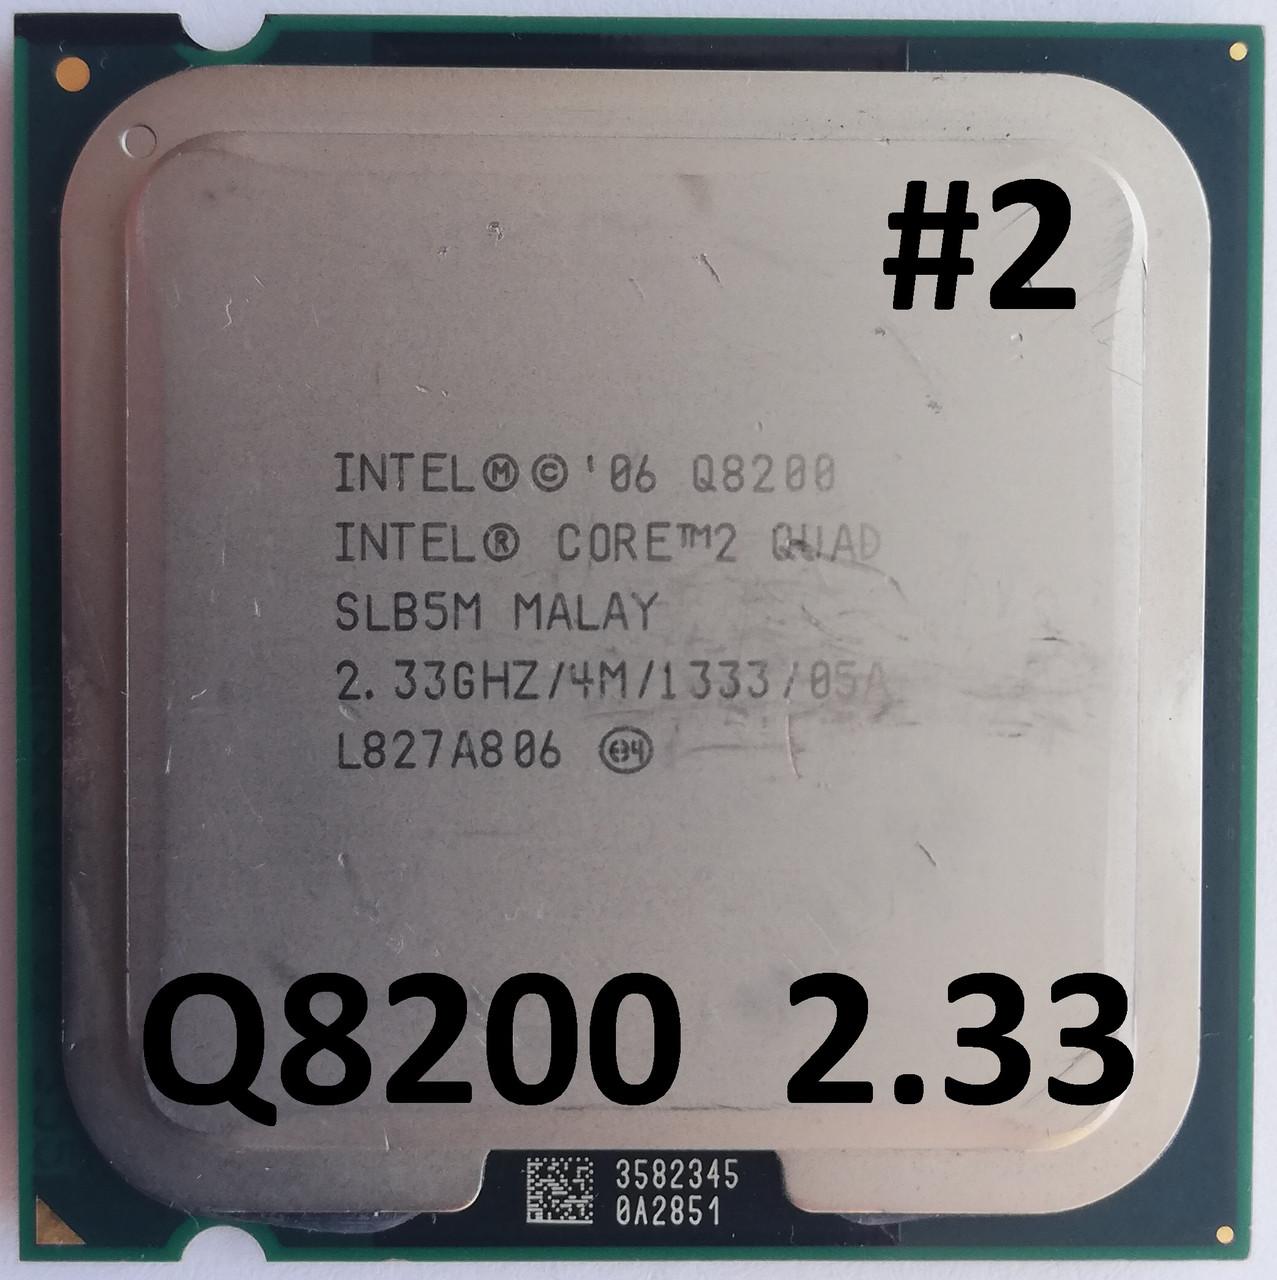 Процессор ЛОТ#2 Intel® Core™2 Quad Q8200 M1 SLB5M 2.33GHz 4M Cache 1333 MHz FSB Socket 775 Б/У